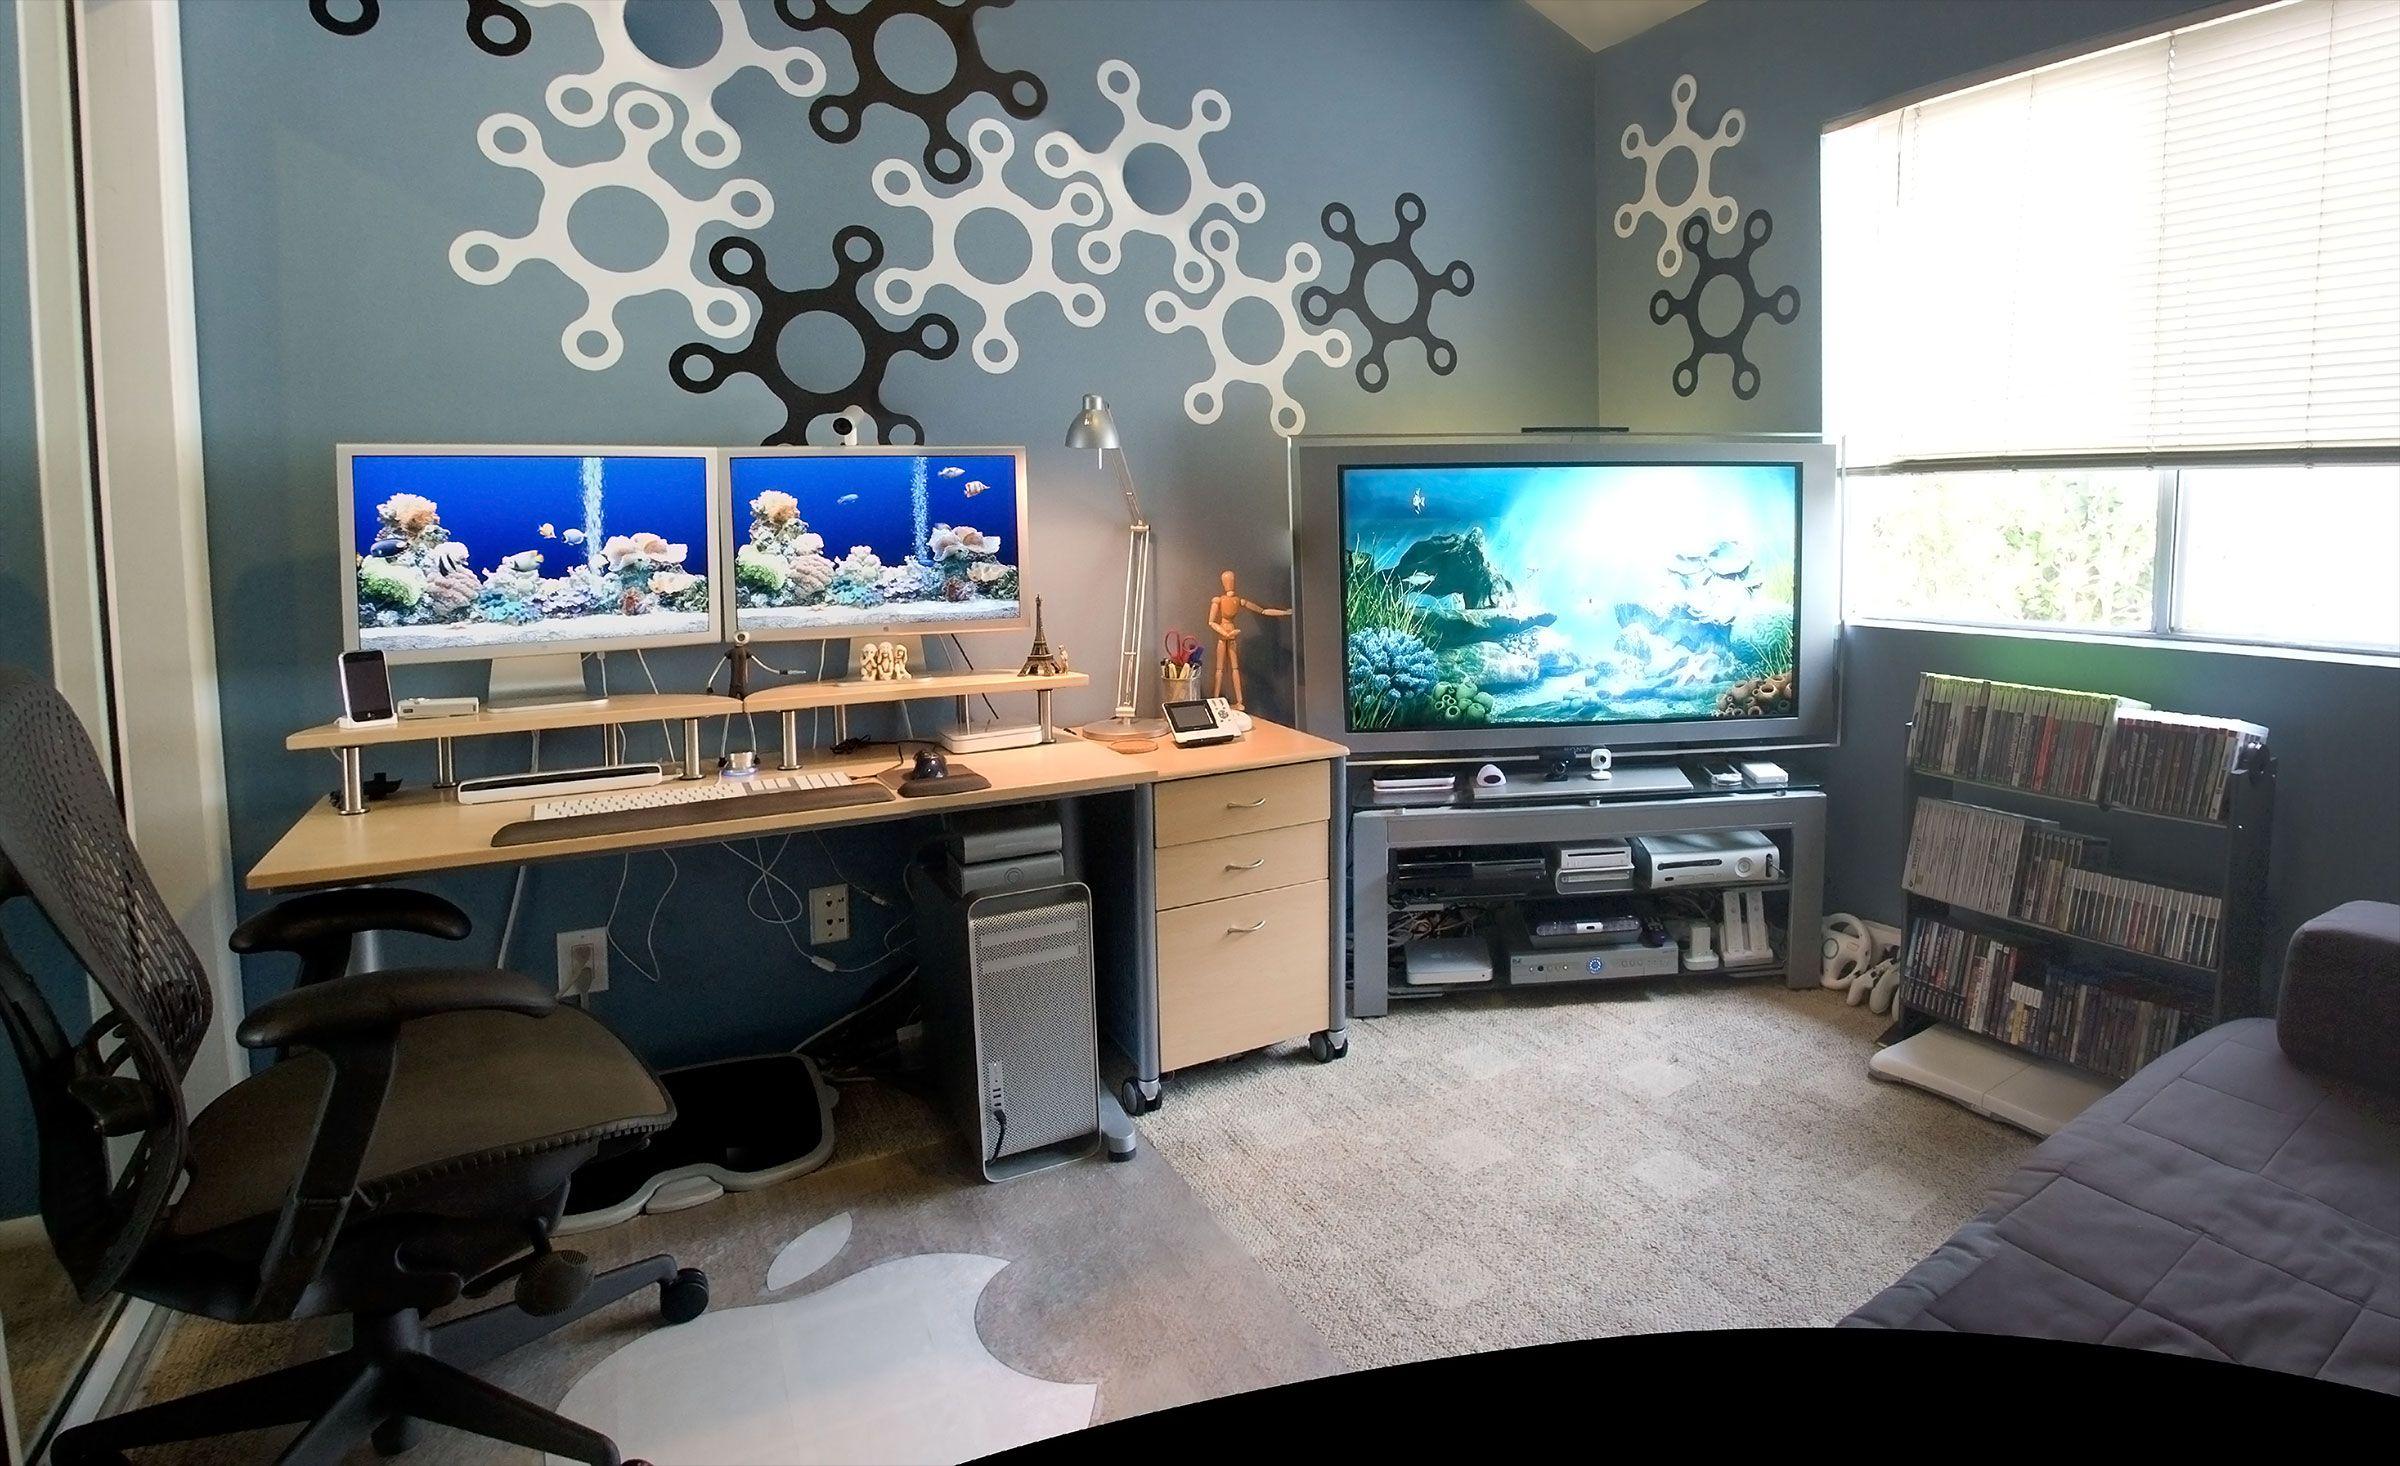 Dual Monitor Mac Pro.. Very Clean Design. Love The Setup